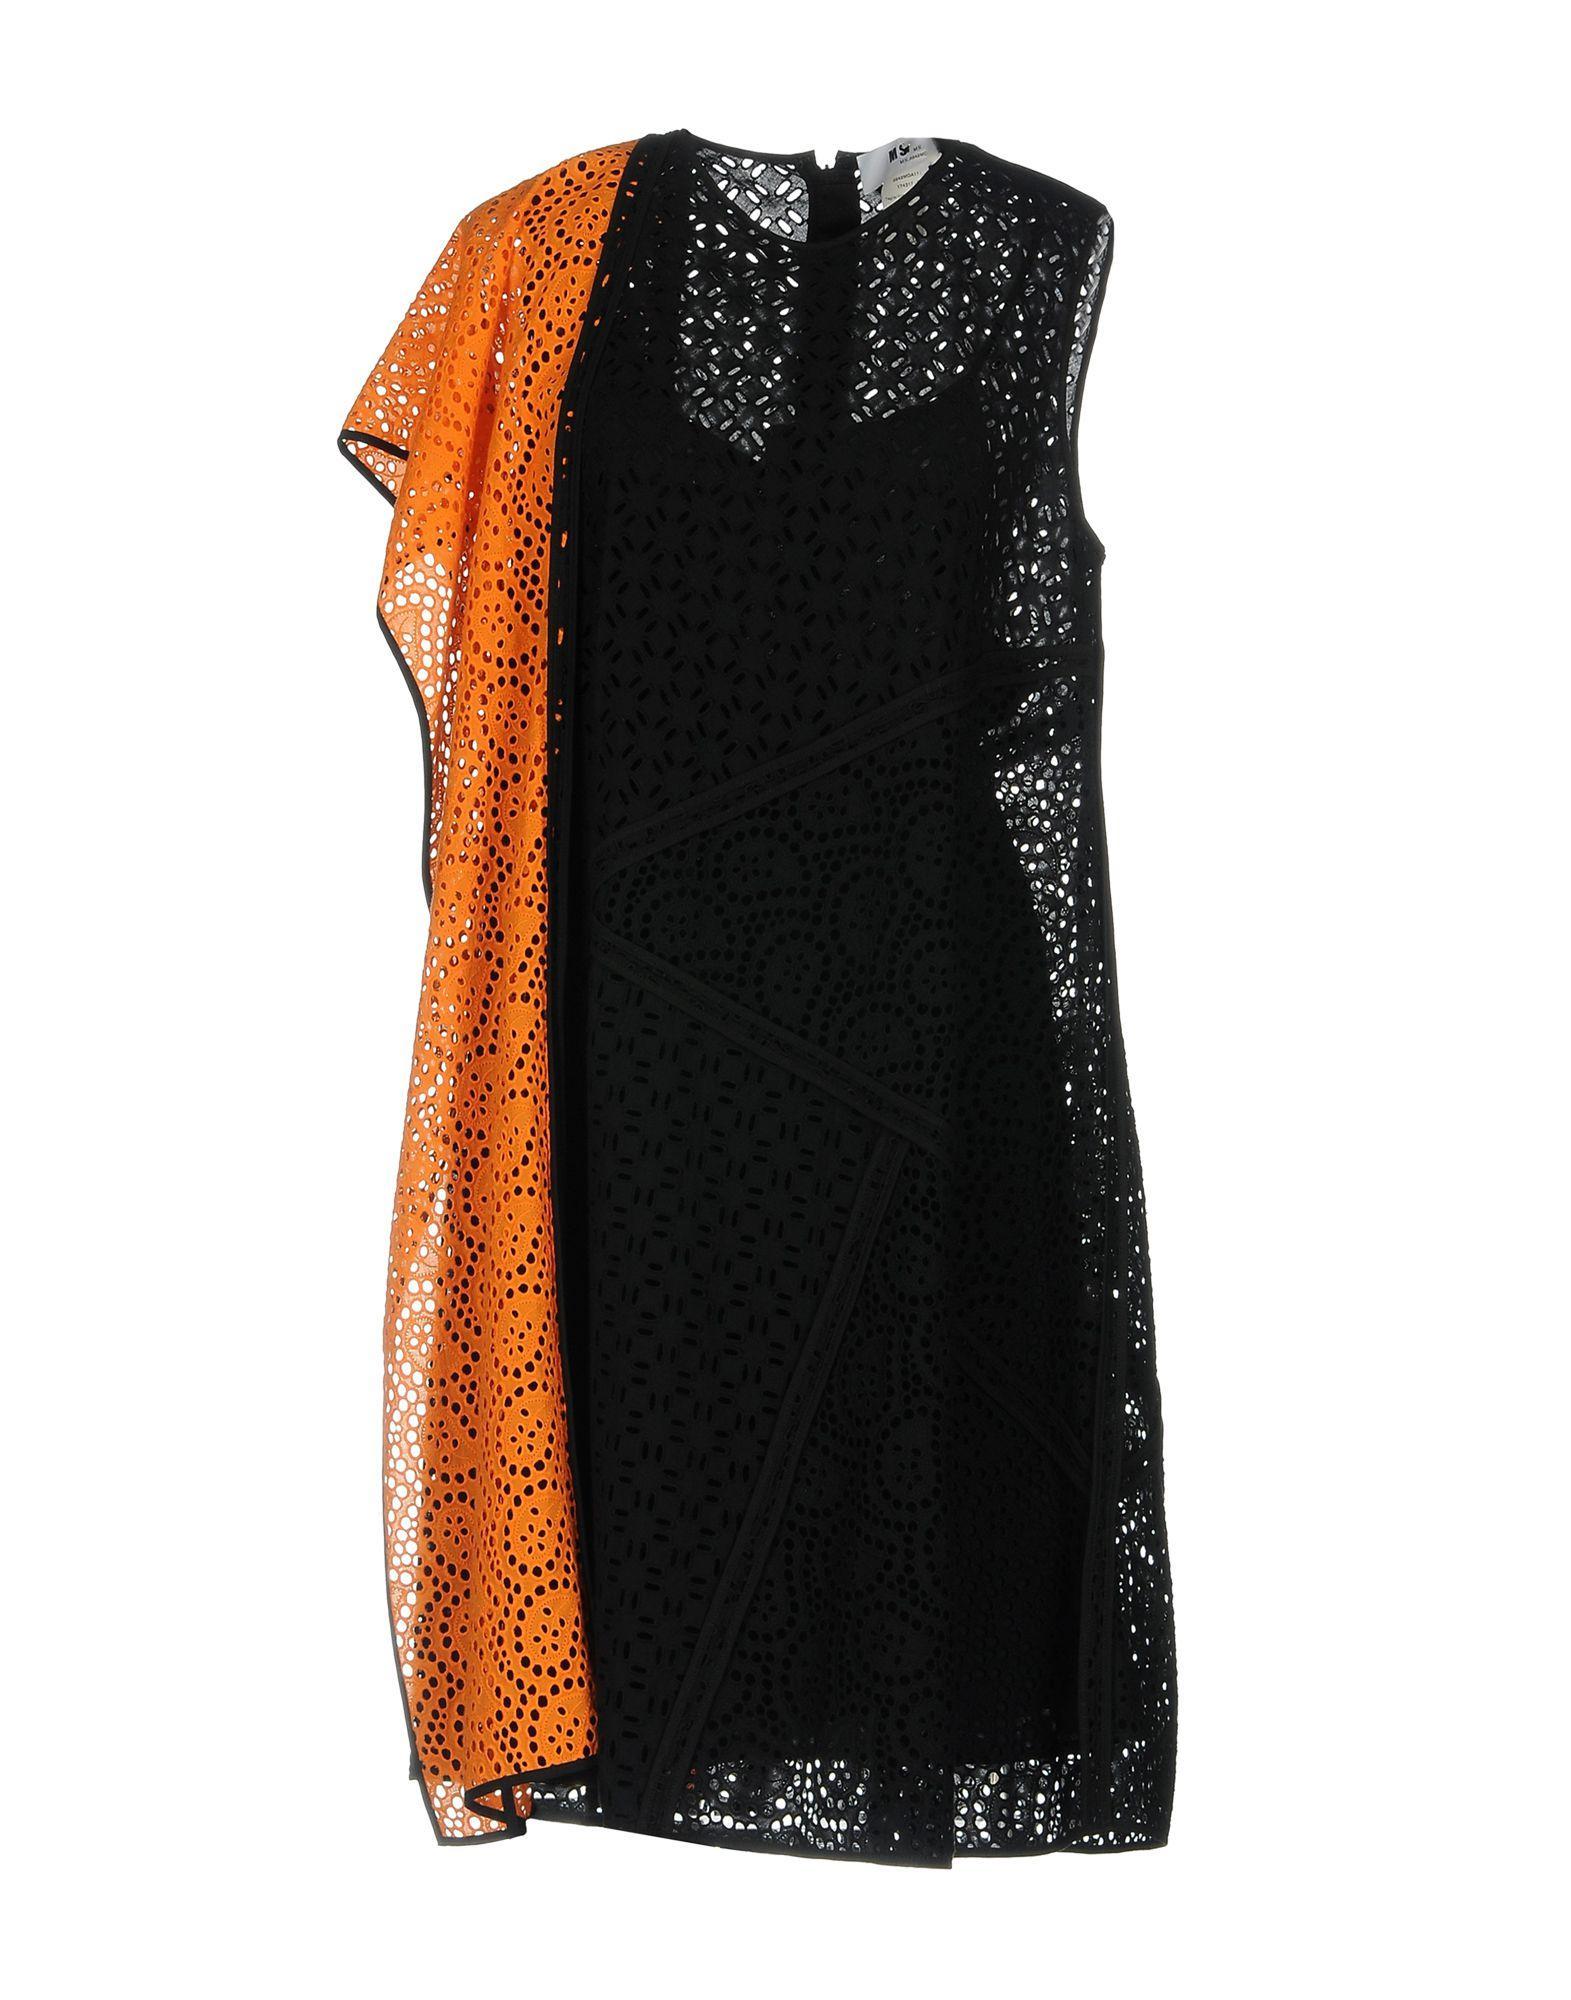 Msgm Knee-length Dress In Black